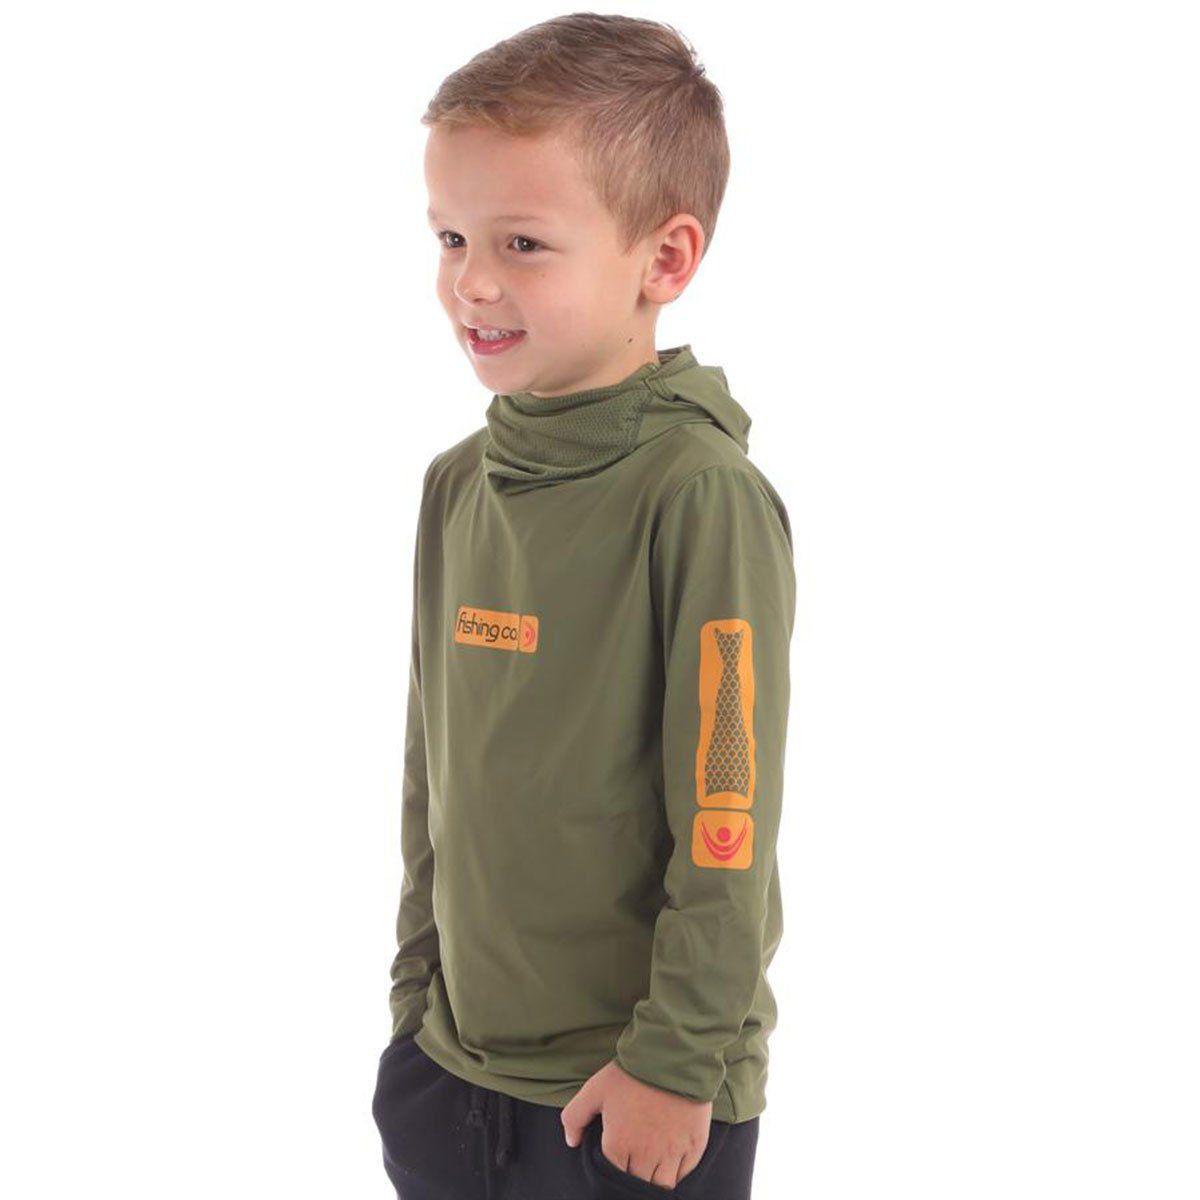 Camiseta Infantil Fishing Co Ninja Verde Militar